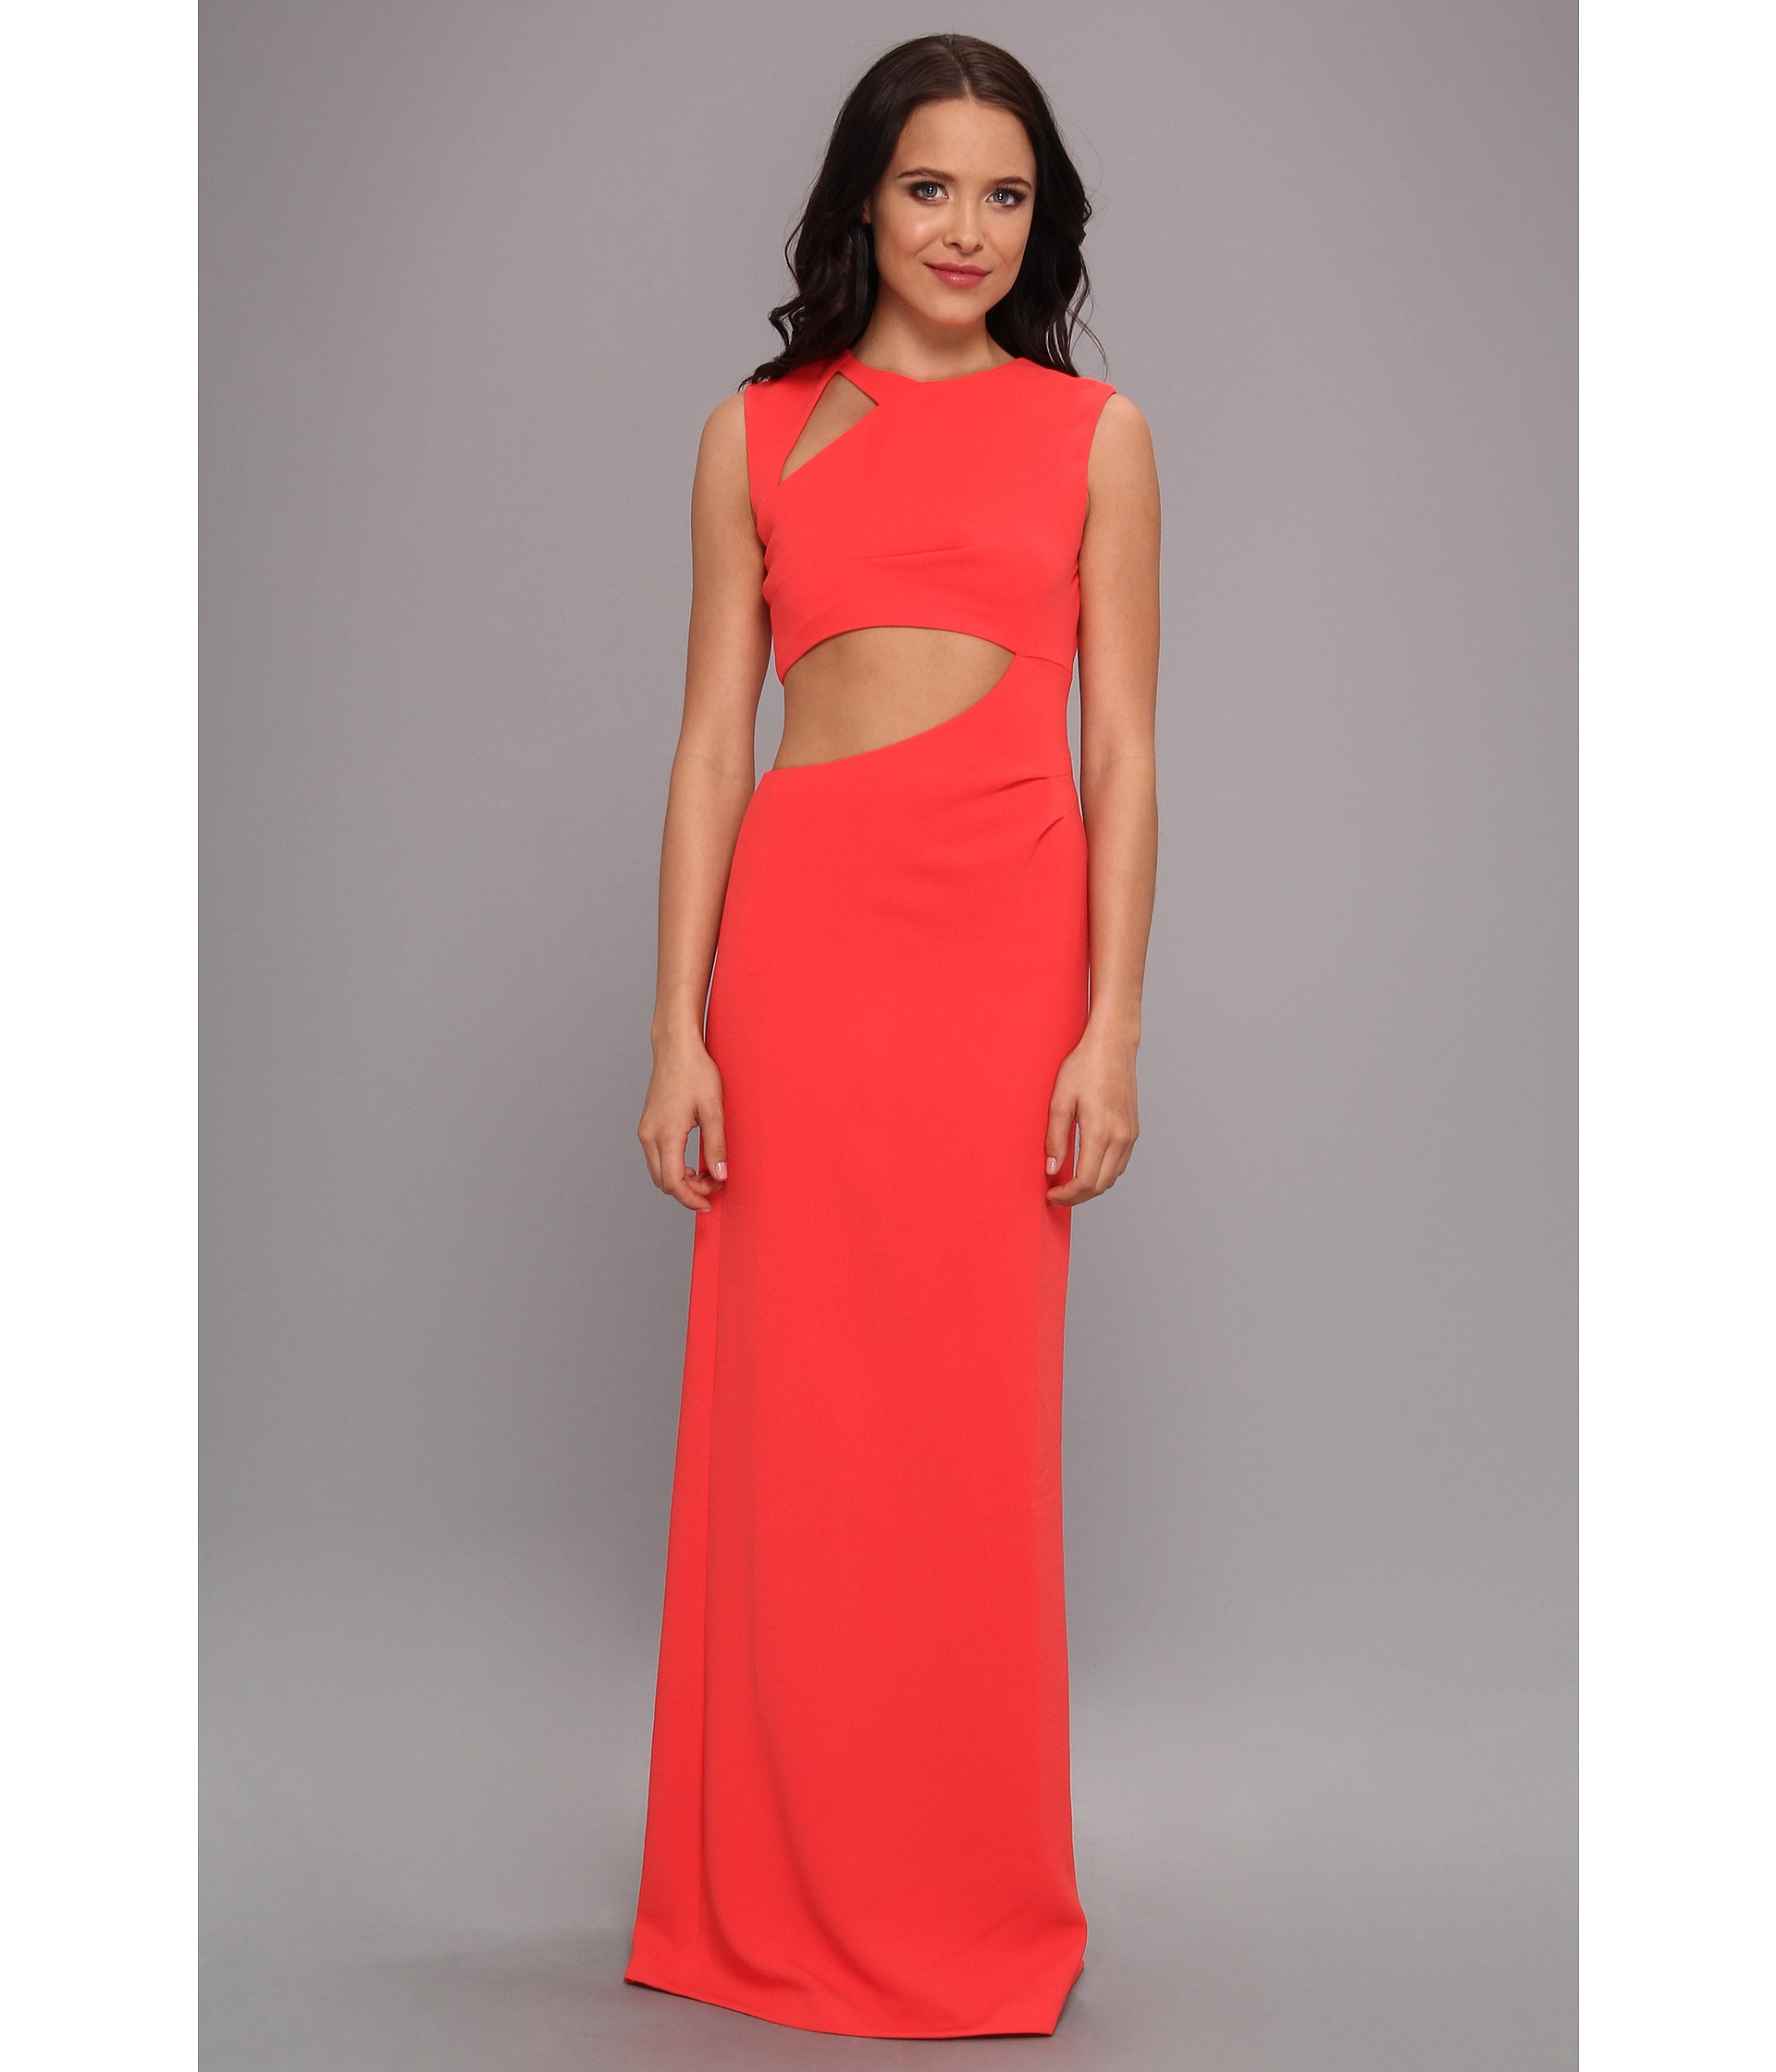 Lyst - Bcbgmaxazria Kimora Cutout Evening Gown in Red